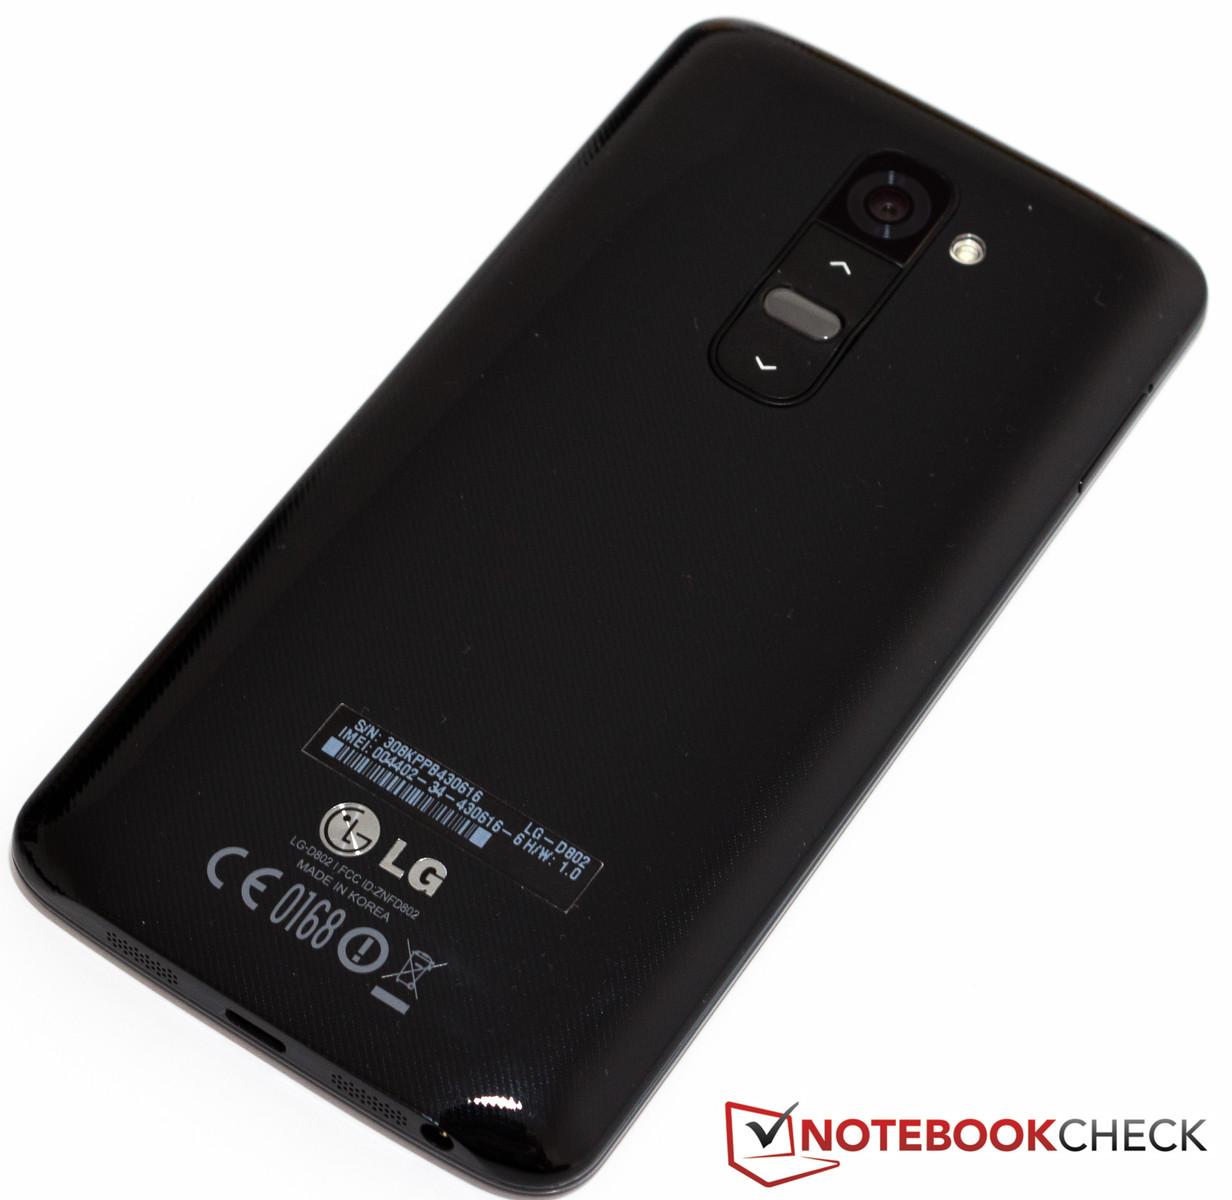 Review Lg G2 Smartphone Notebookcheck Net Reviews